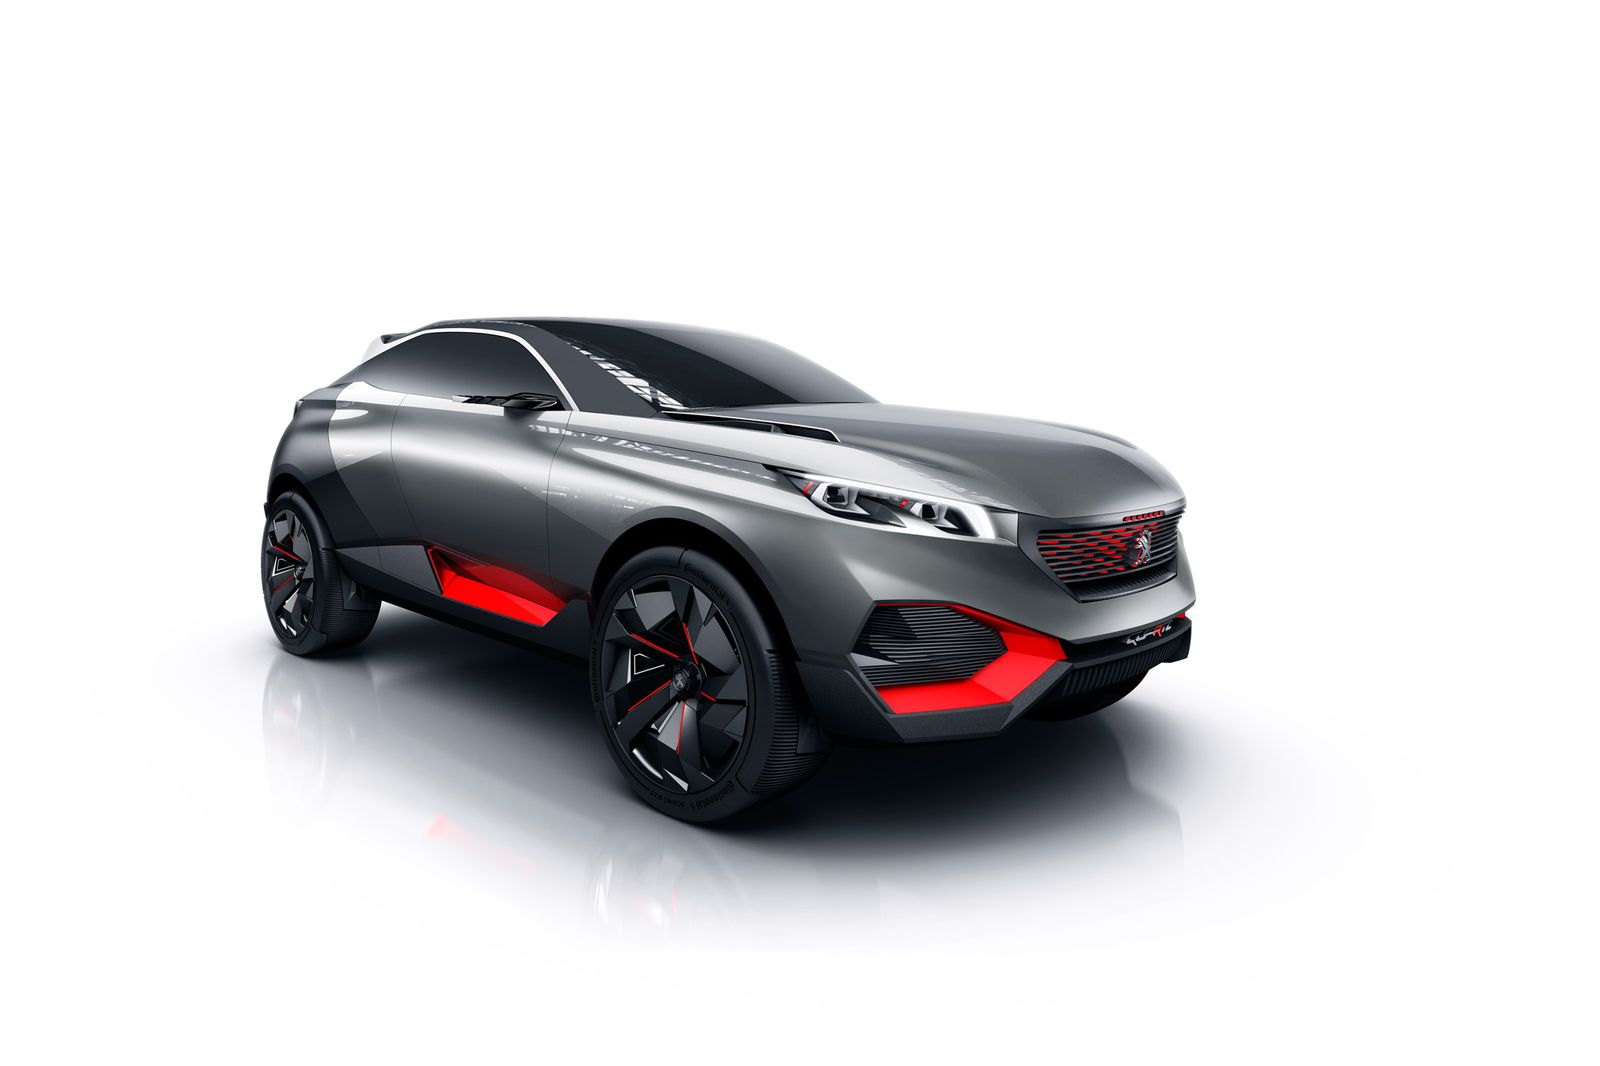 2014 / Peugeot Quartz Concept